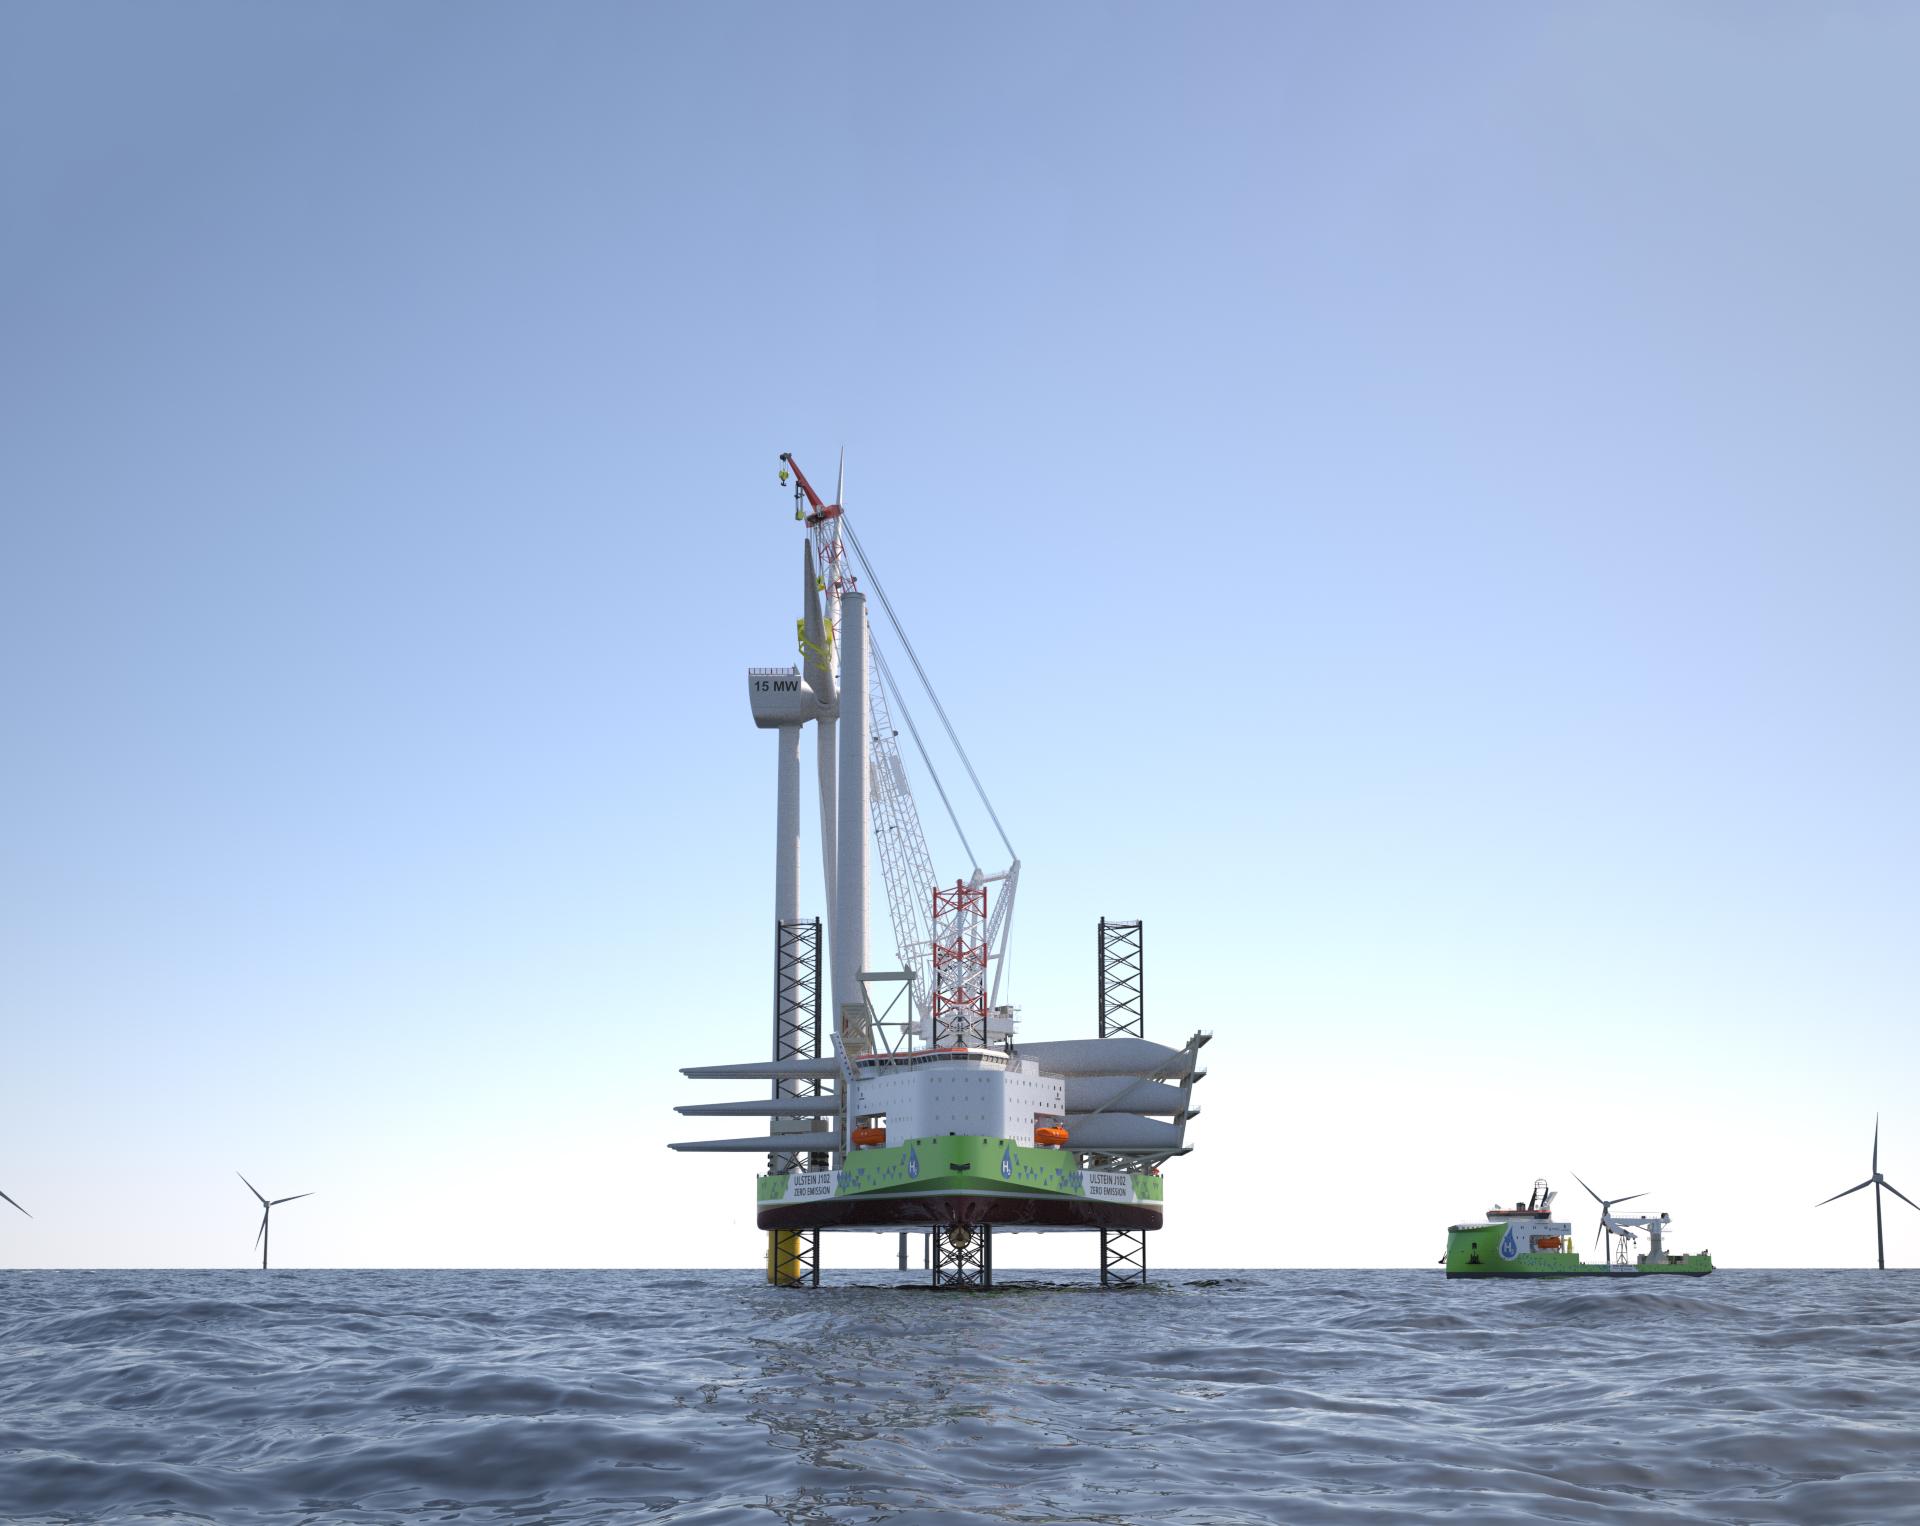 Zero-emission turbine installation is today's reality